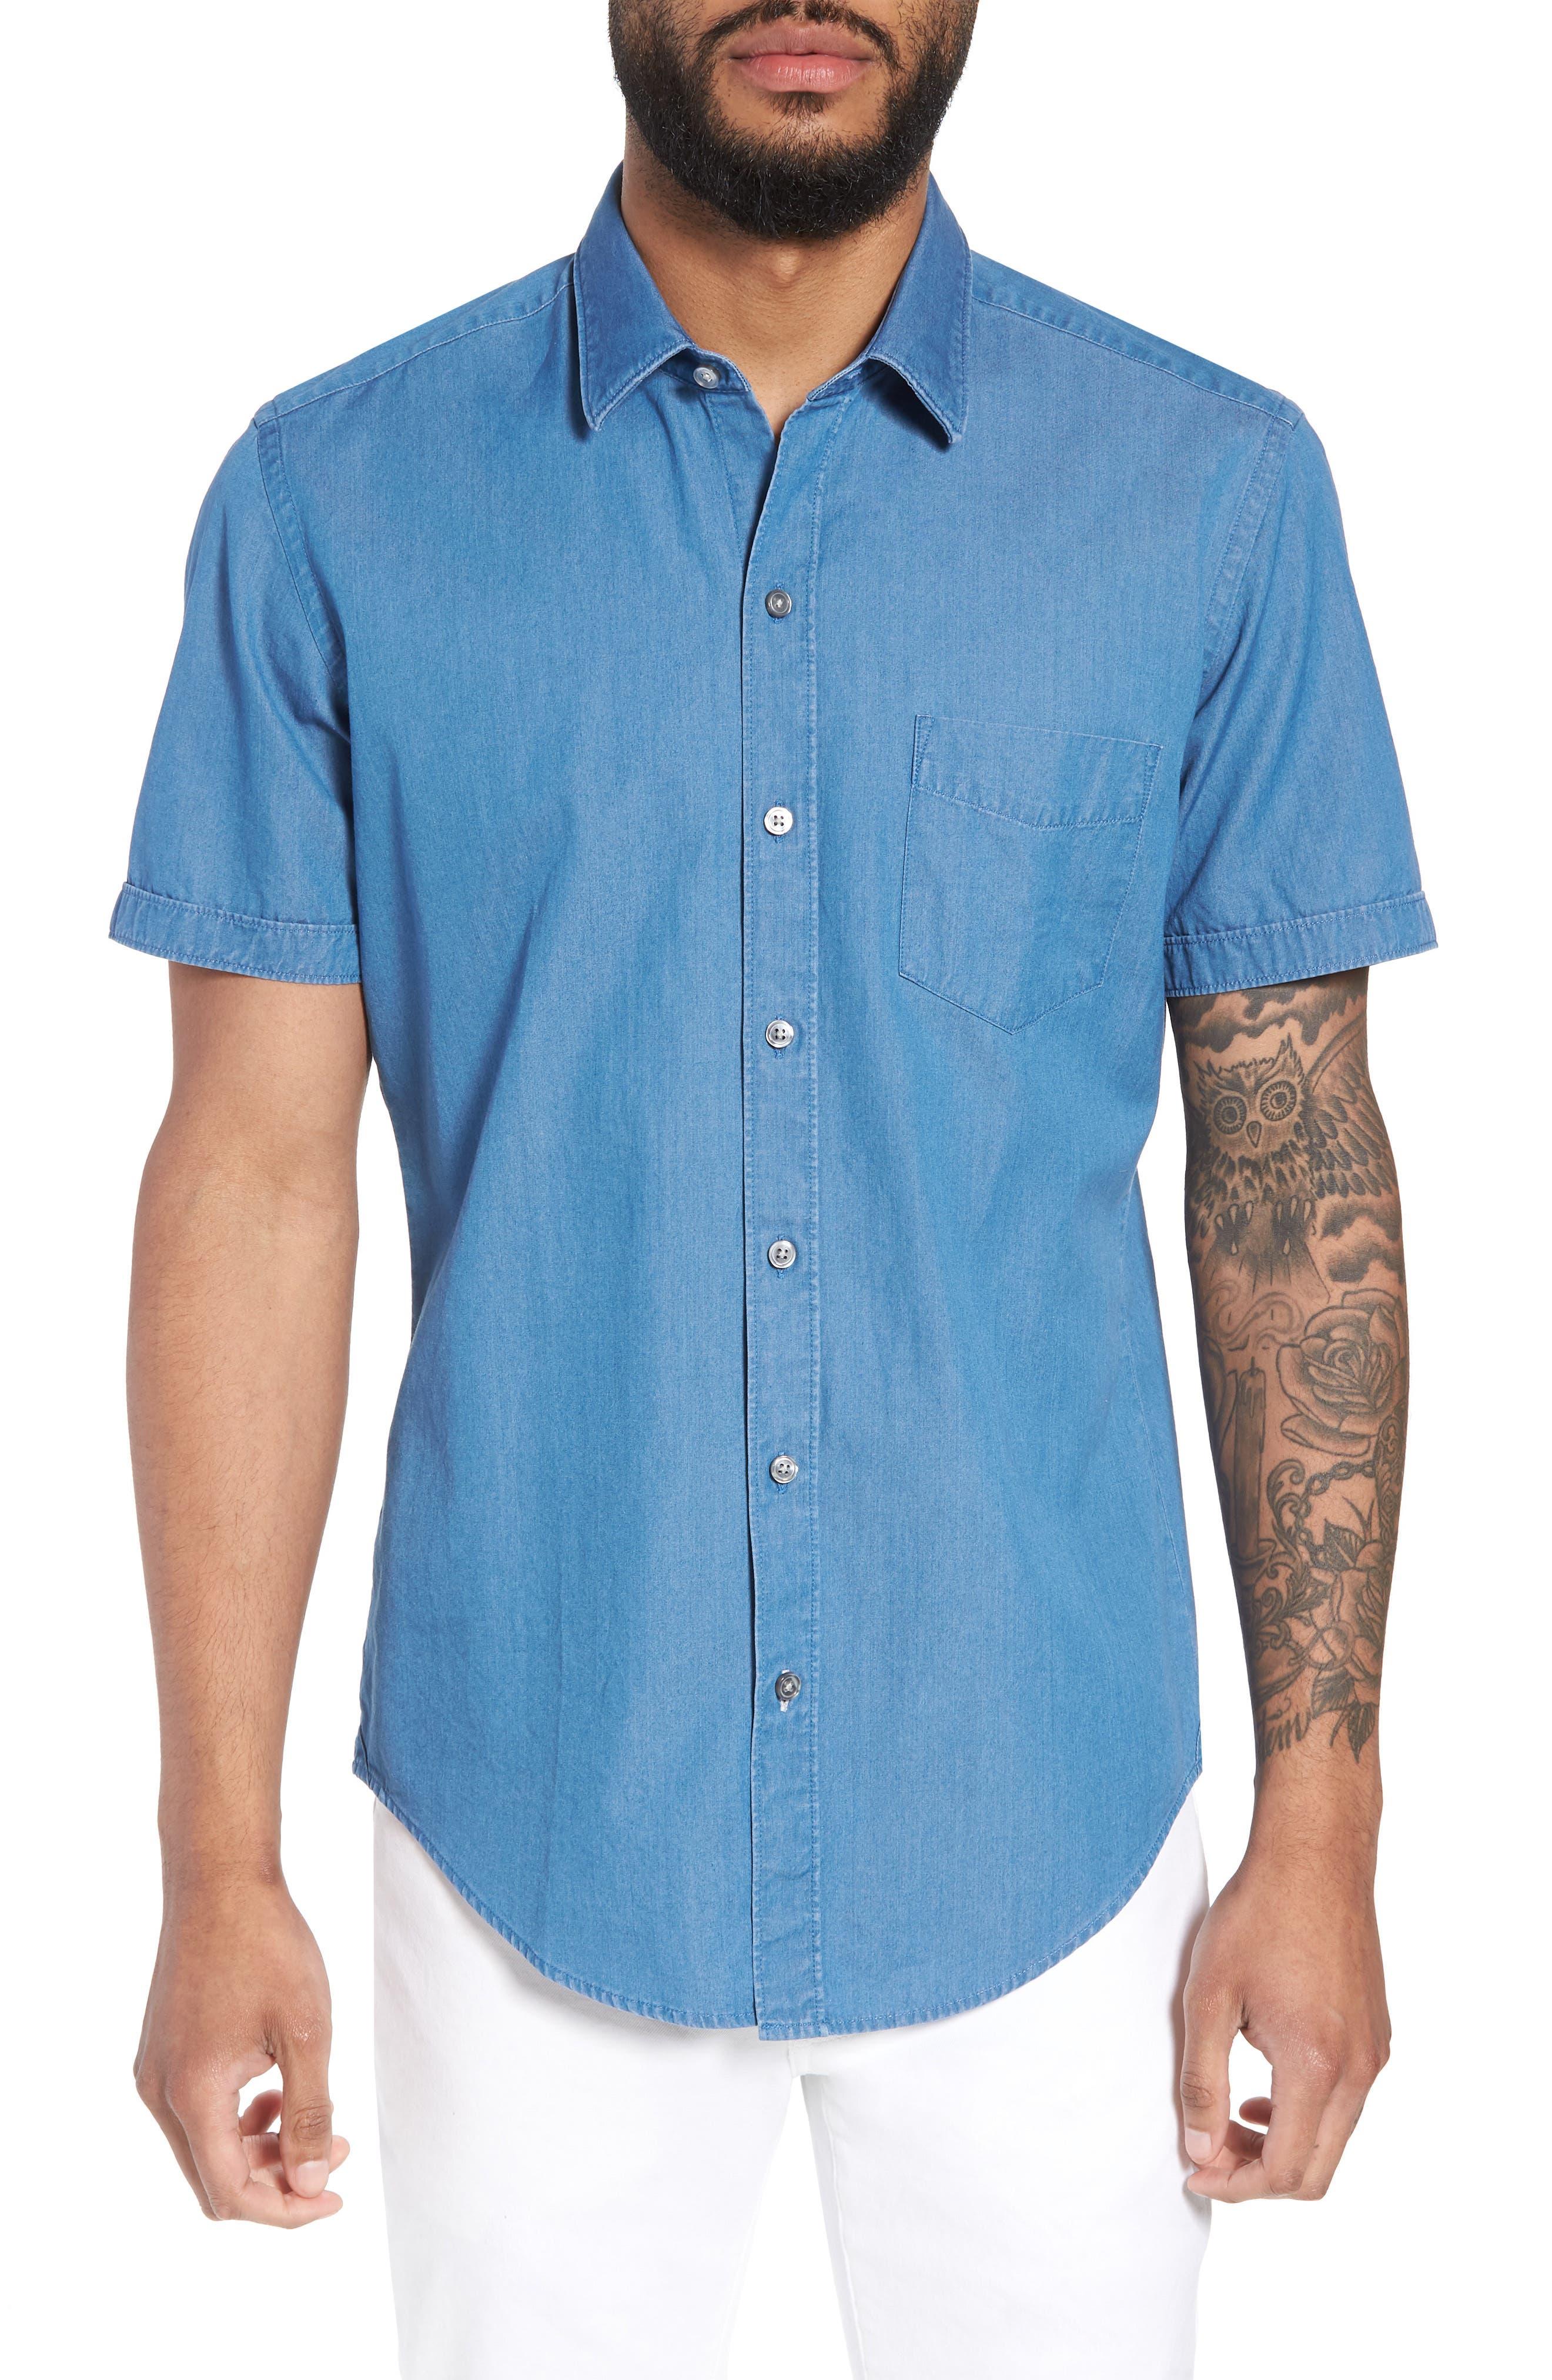 Robb Trim Fit Denim Short Sleeve Sport Shirt,                             Main thumbnail 1, color,                             BLUE